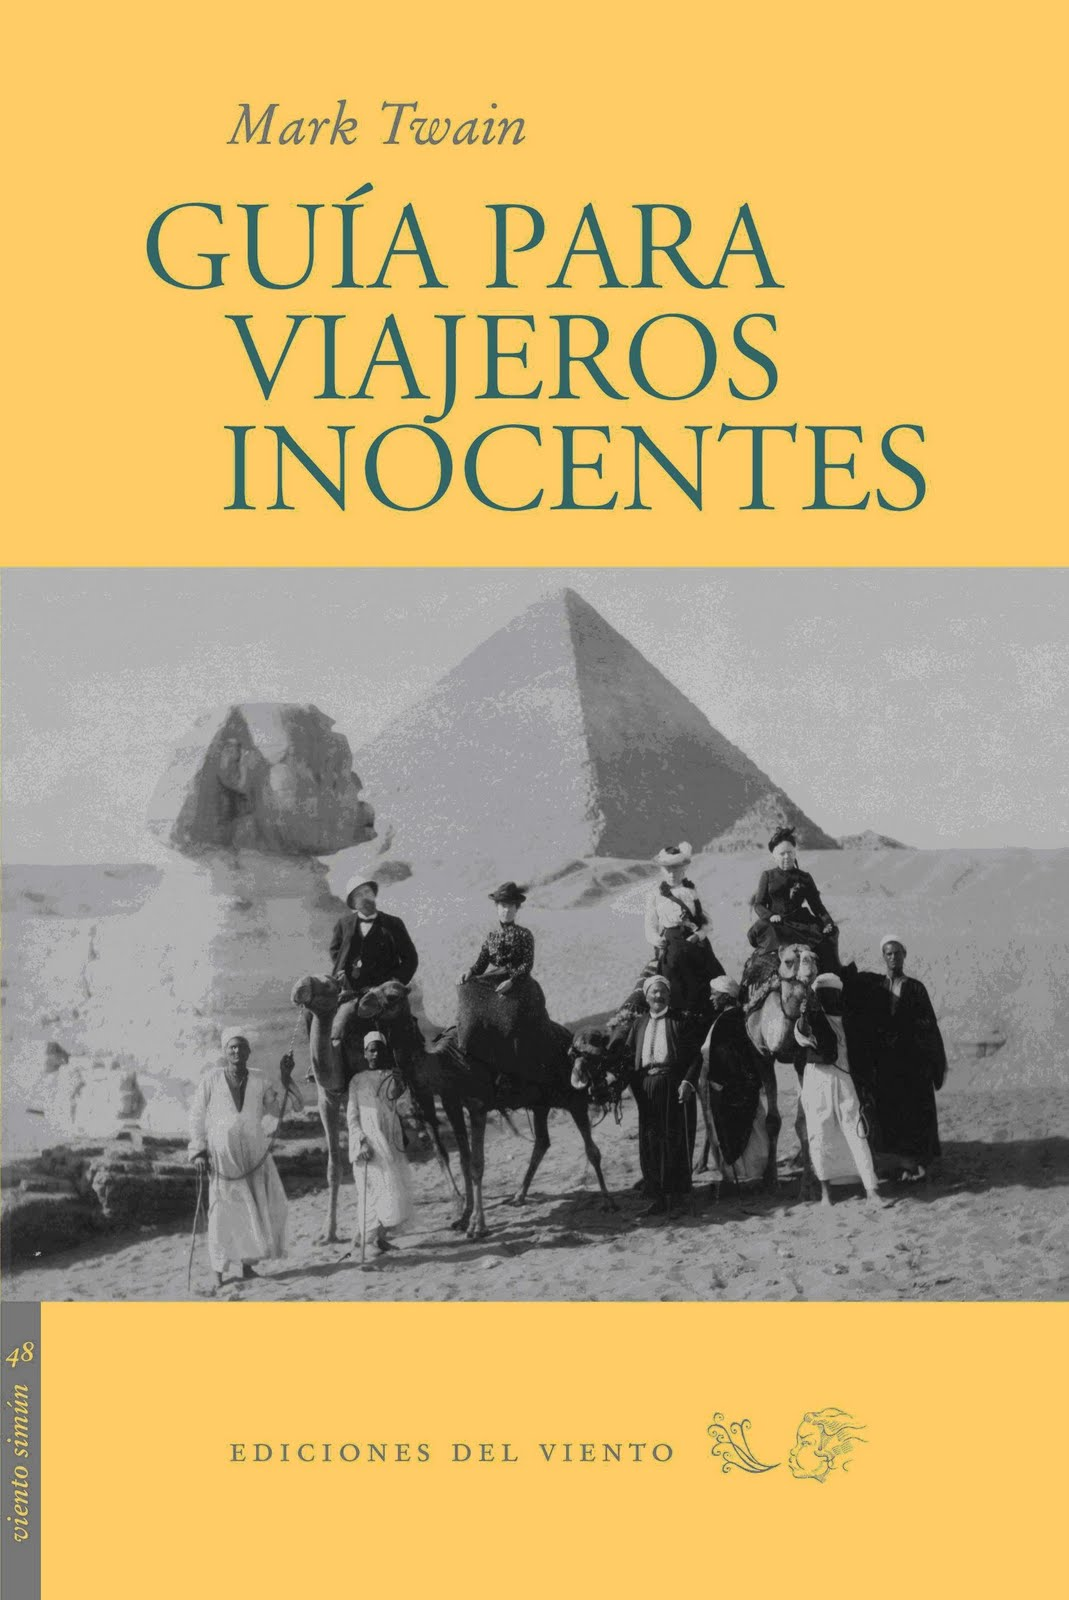 https://laantiguabiblos.blogspot.com.es/2017/04/guia-para-viajeros-inocentes-mark-twain.html